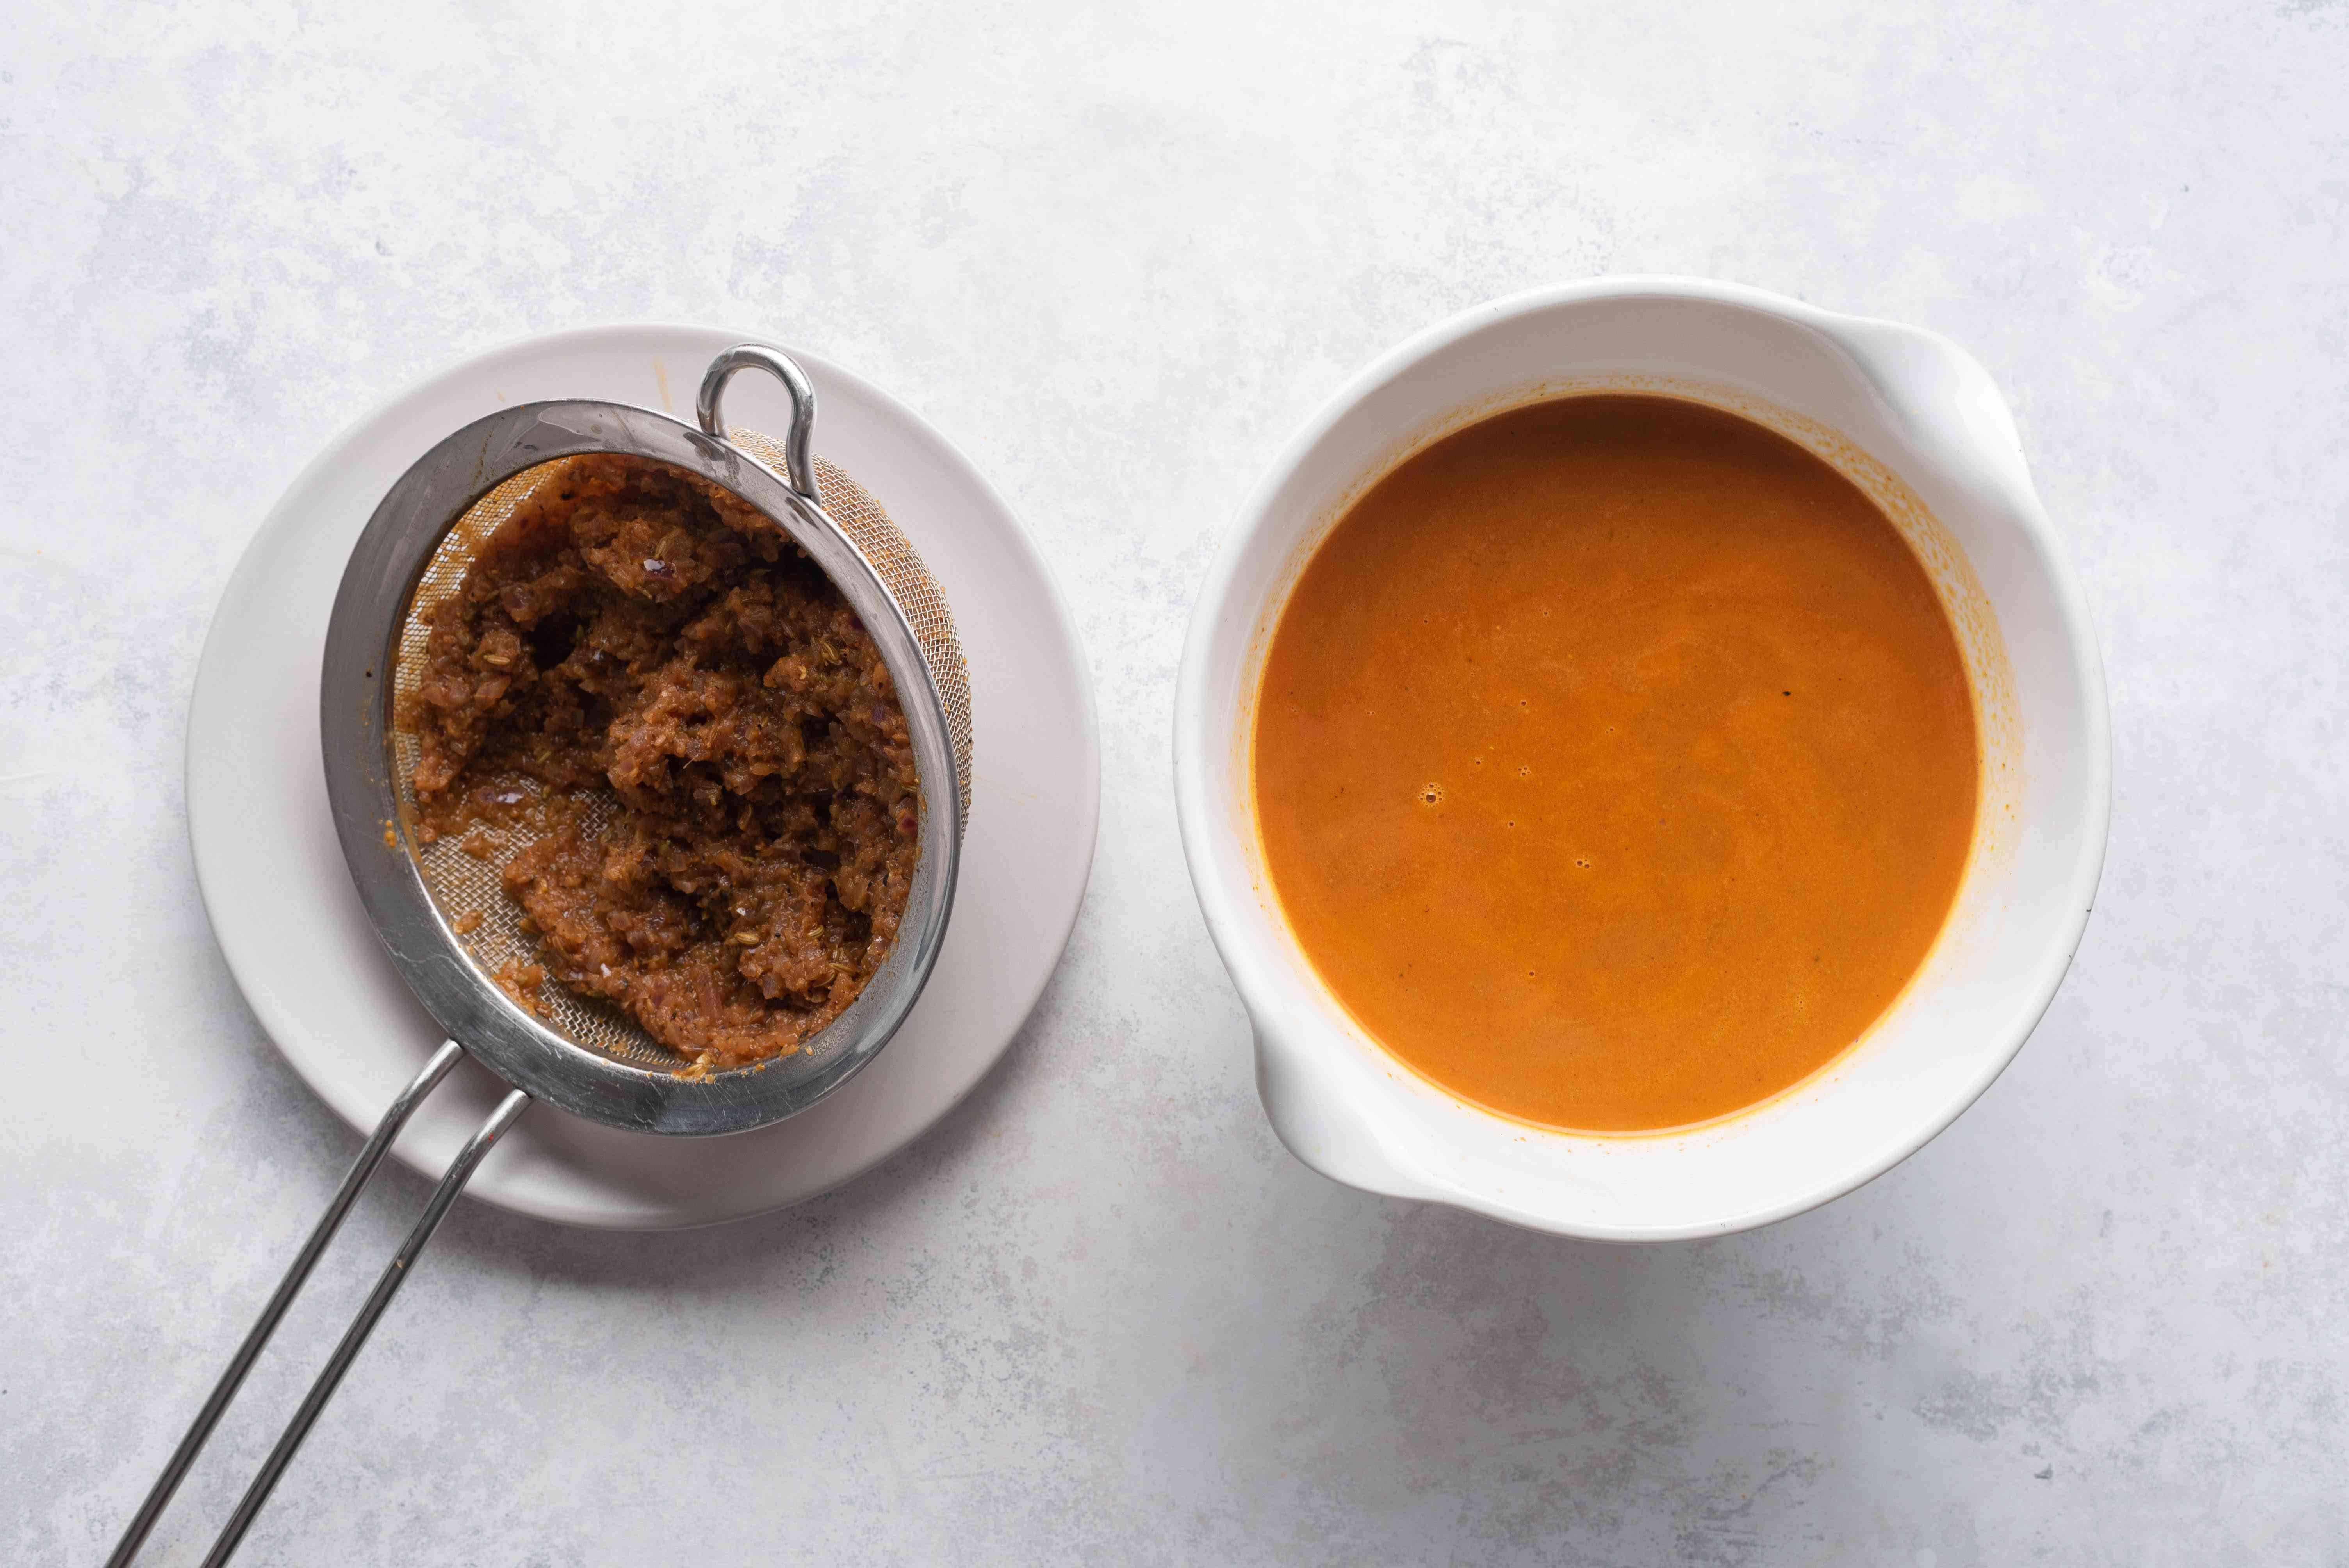 Pass the sauce through a fine sieve into a bowl